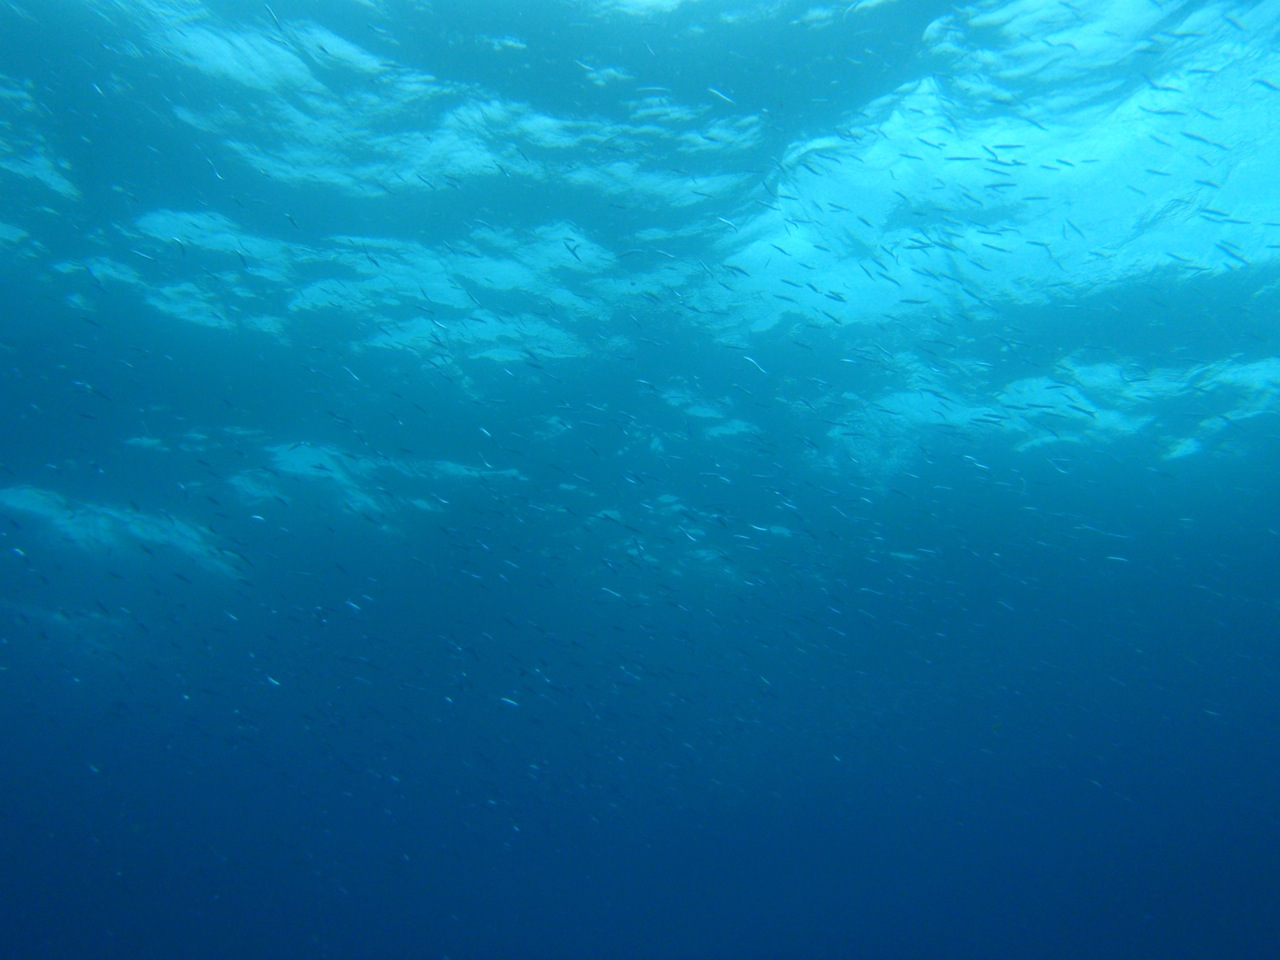 http://www.aquamarine-dive.net/blog/index.html/2014/07/26/PB093250.jpg